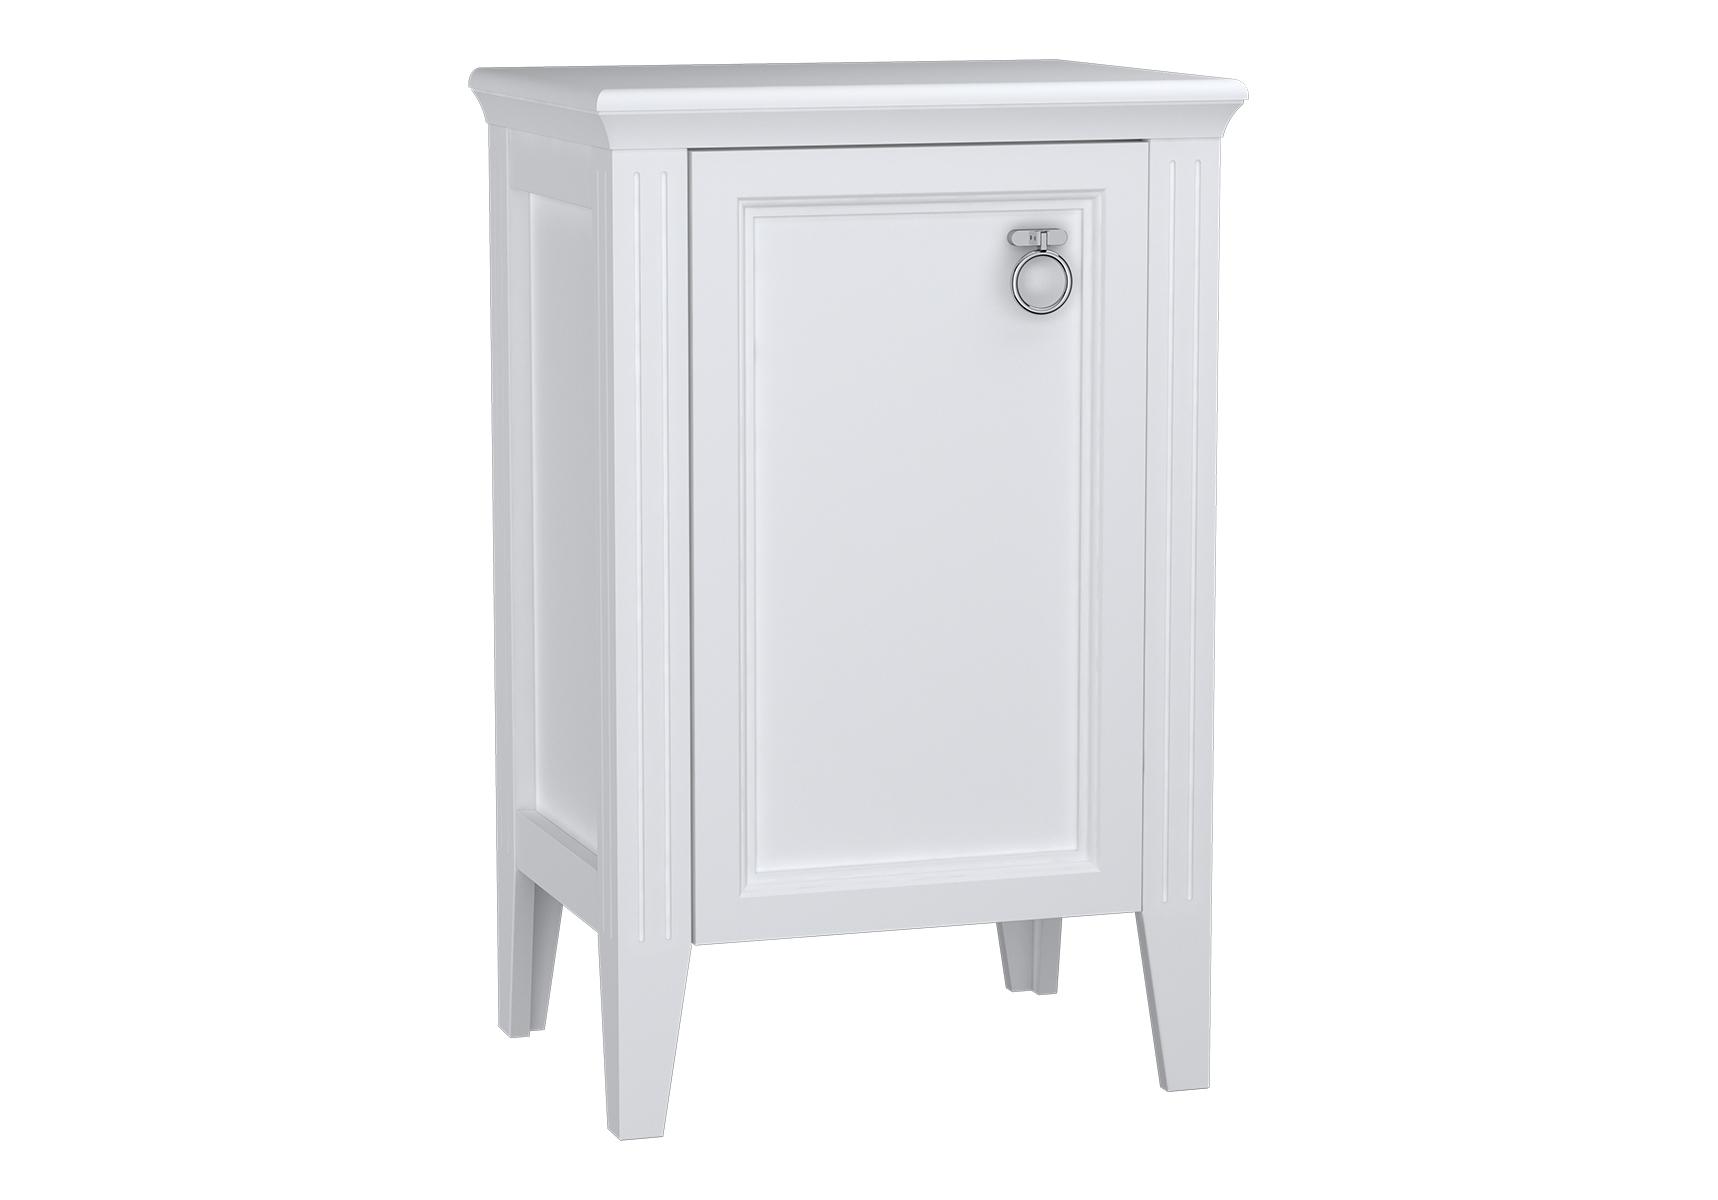 Valarte armoire mi-haute, 55 cm, porte à gauche, blanc mat